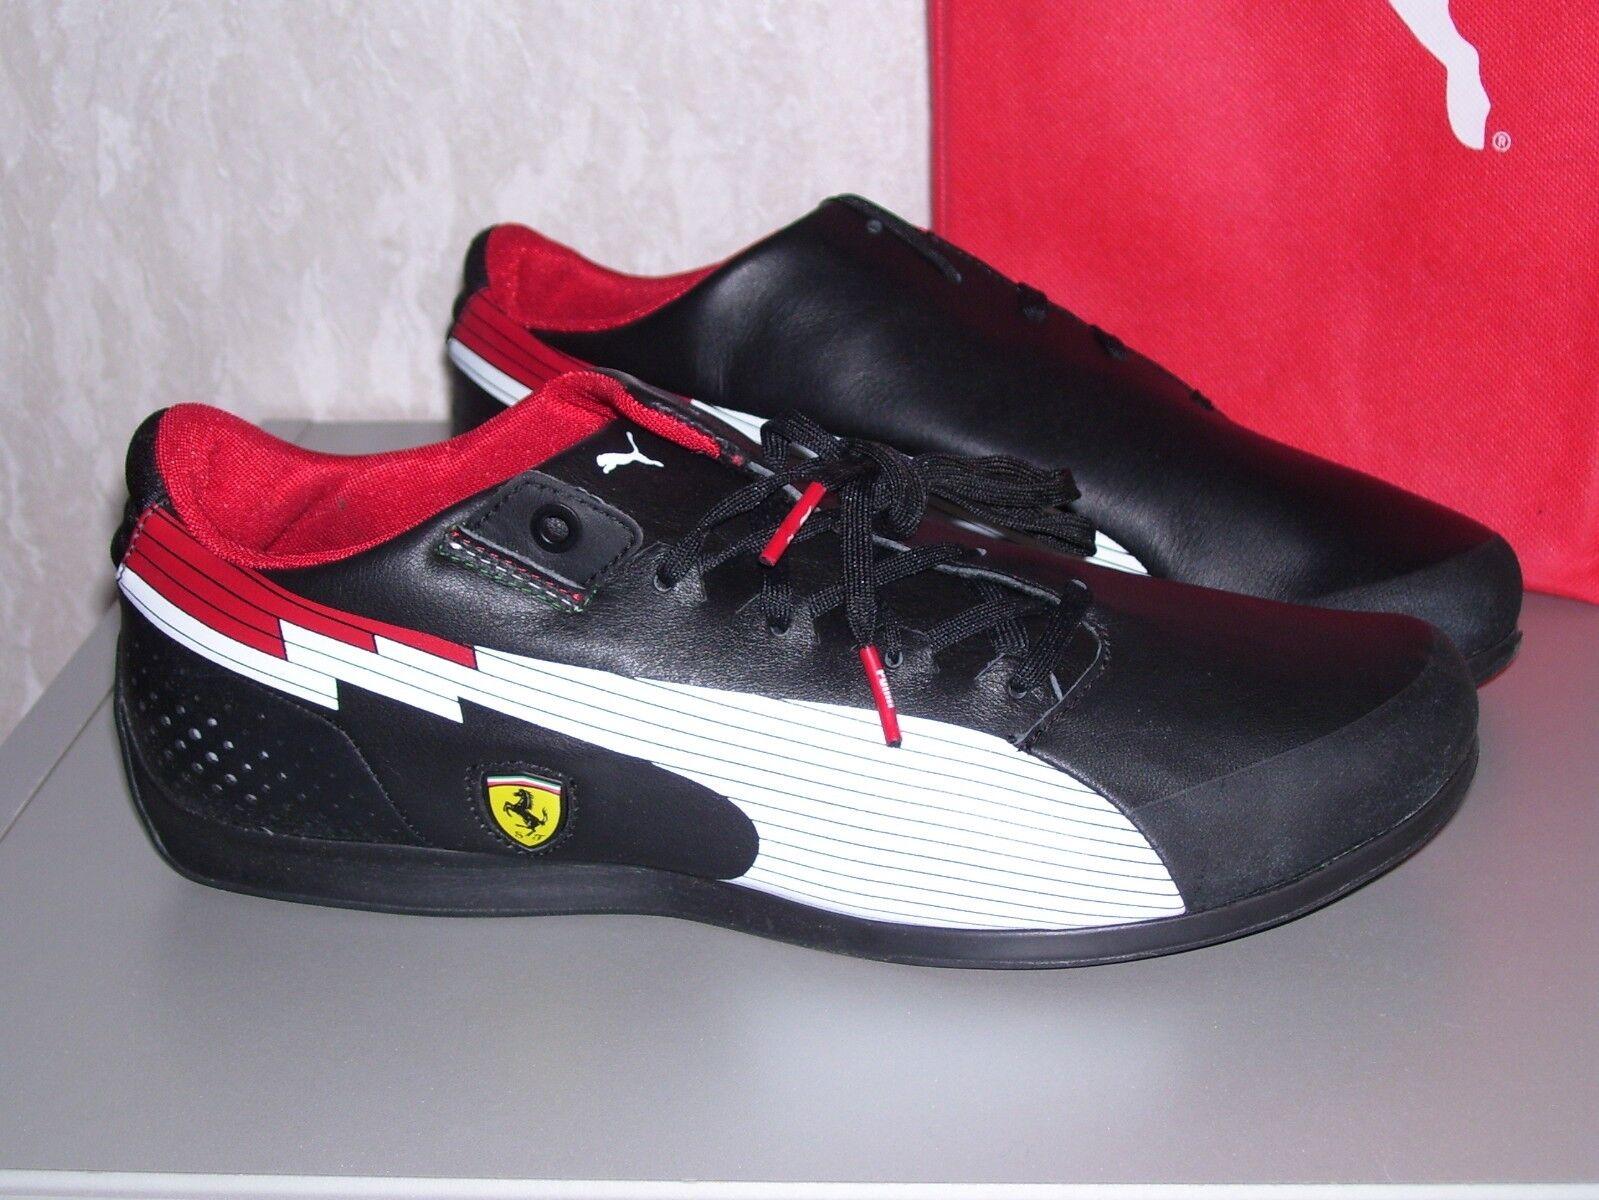 PUMA evoSPEED Low SF schwarz Ferrari Leder Turnschuhe Sneaker schwarz SF 40 41 42 46 neu 0f6b8a